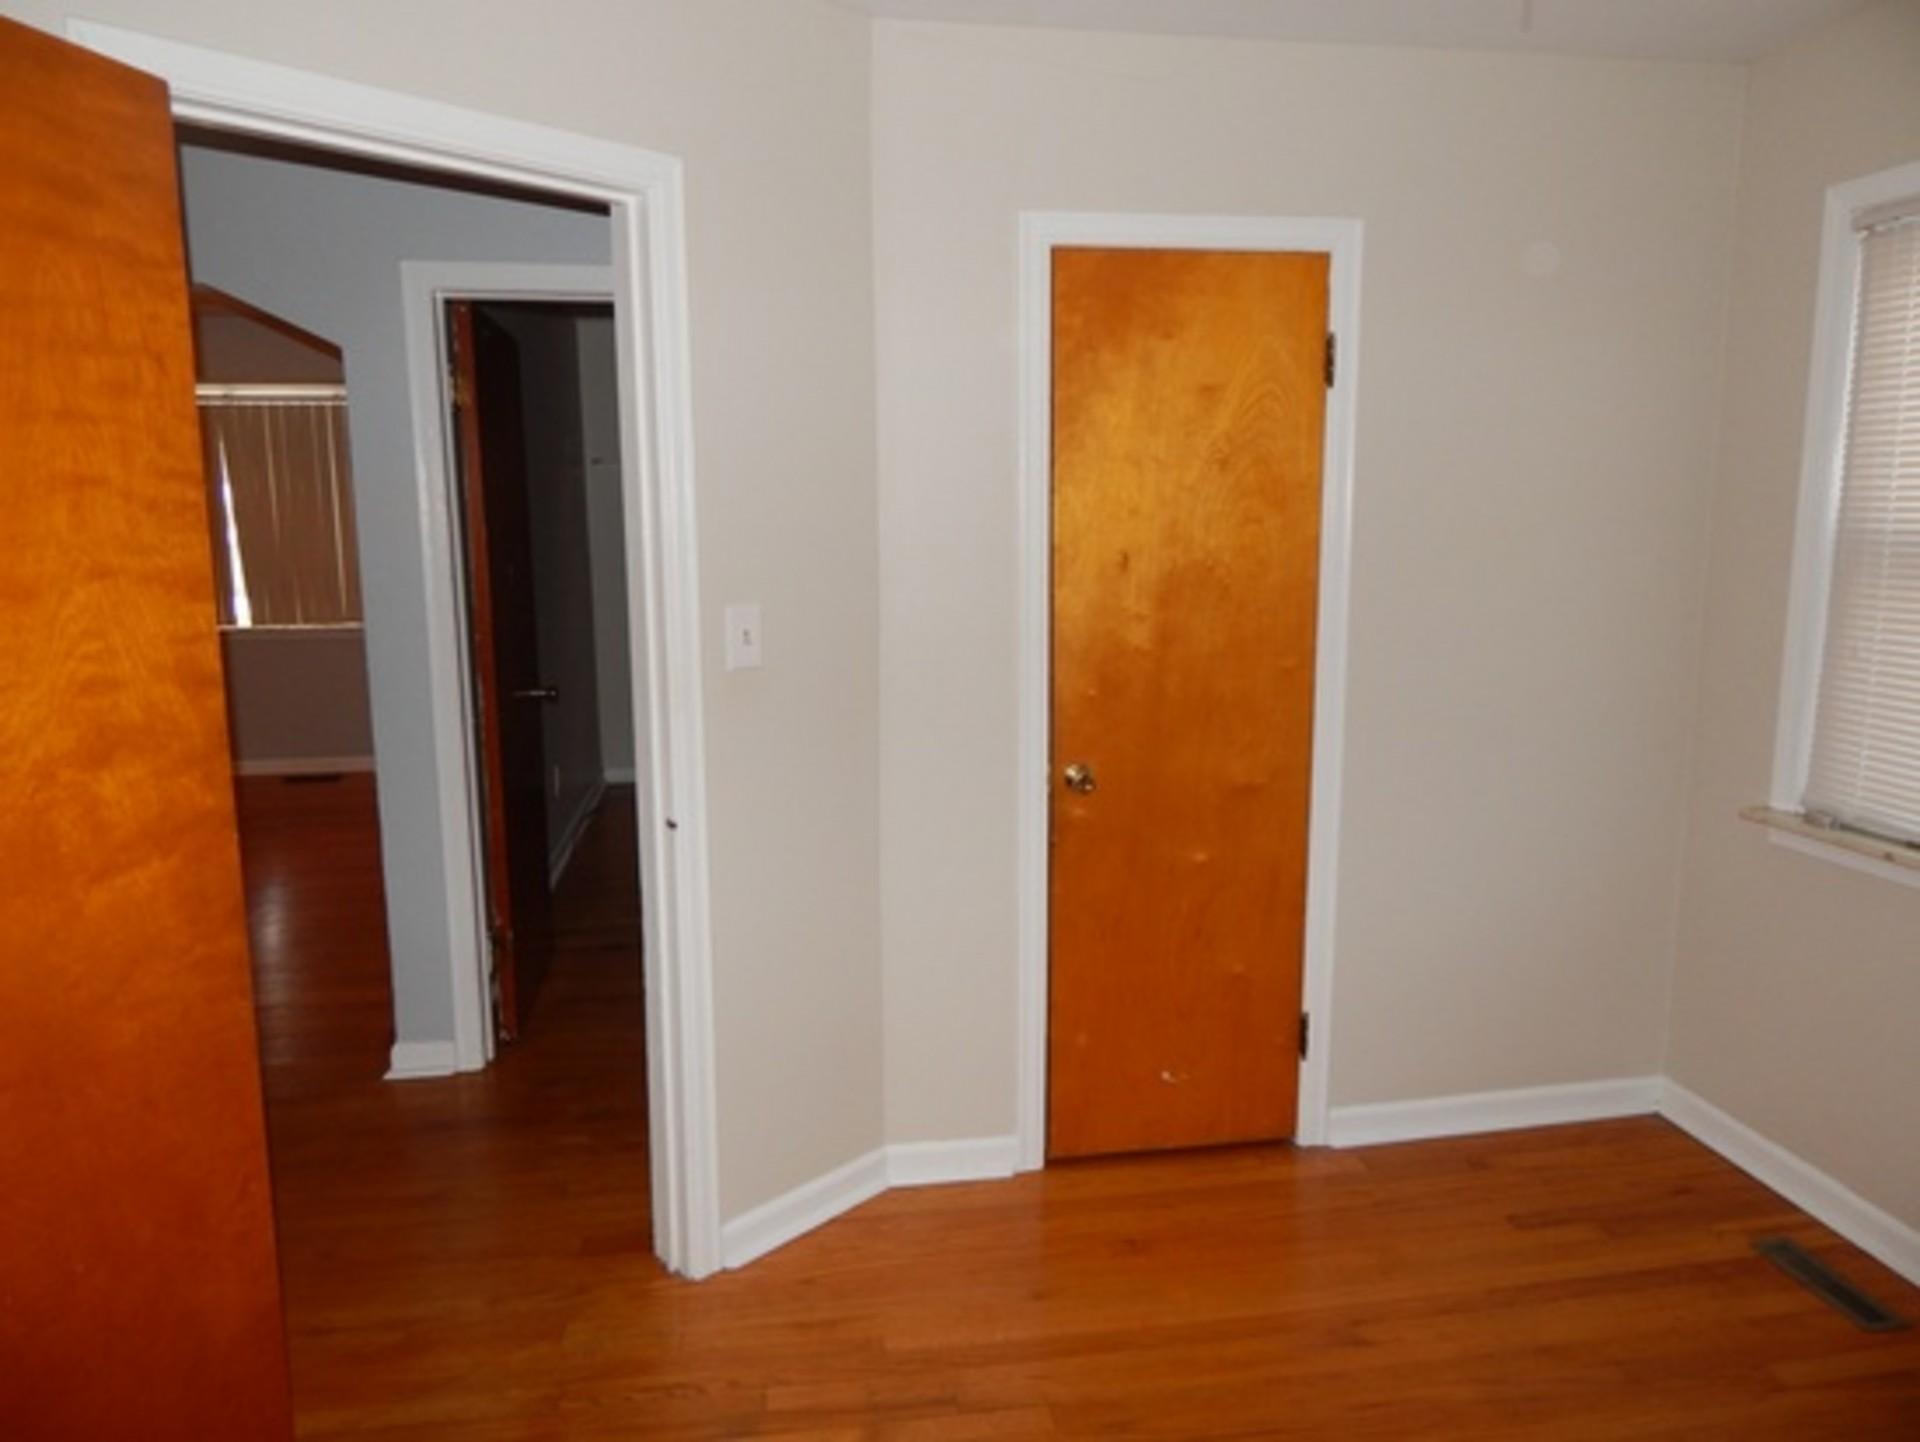 3 Bedroom Apartments In Southfield Mi 17228 Sunnybrook Drive Southfield Mi Walk Score